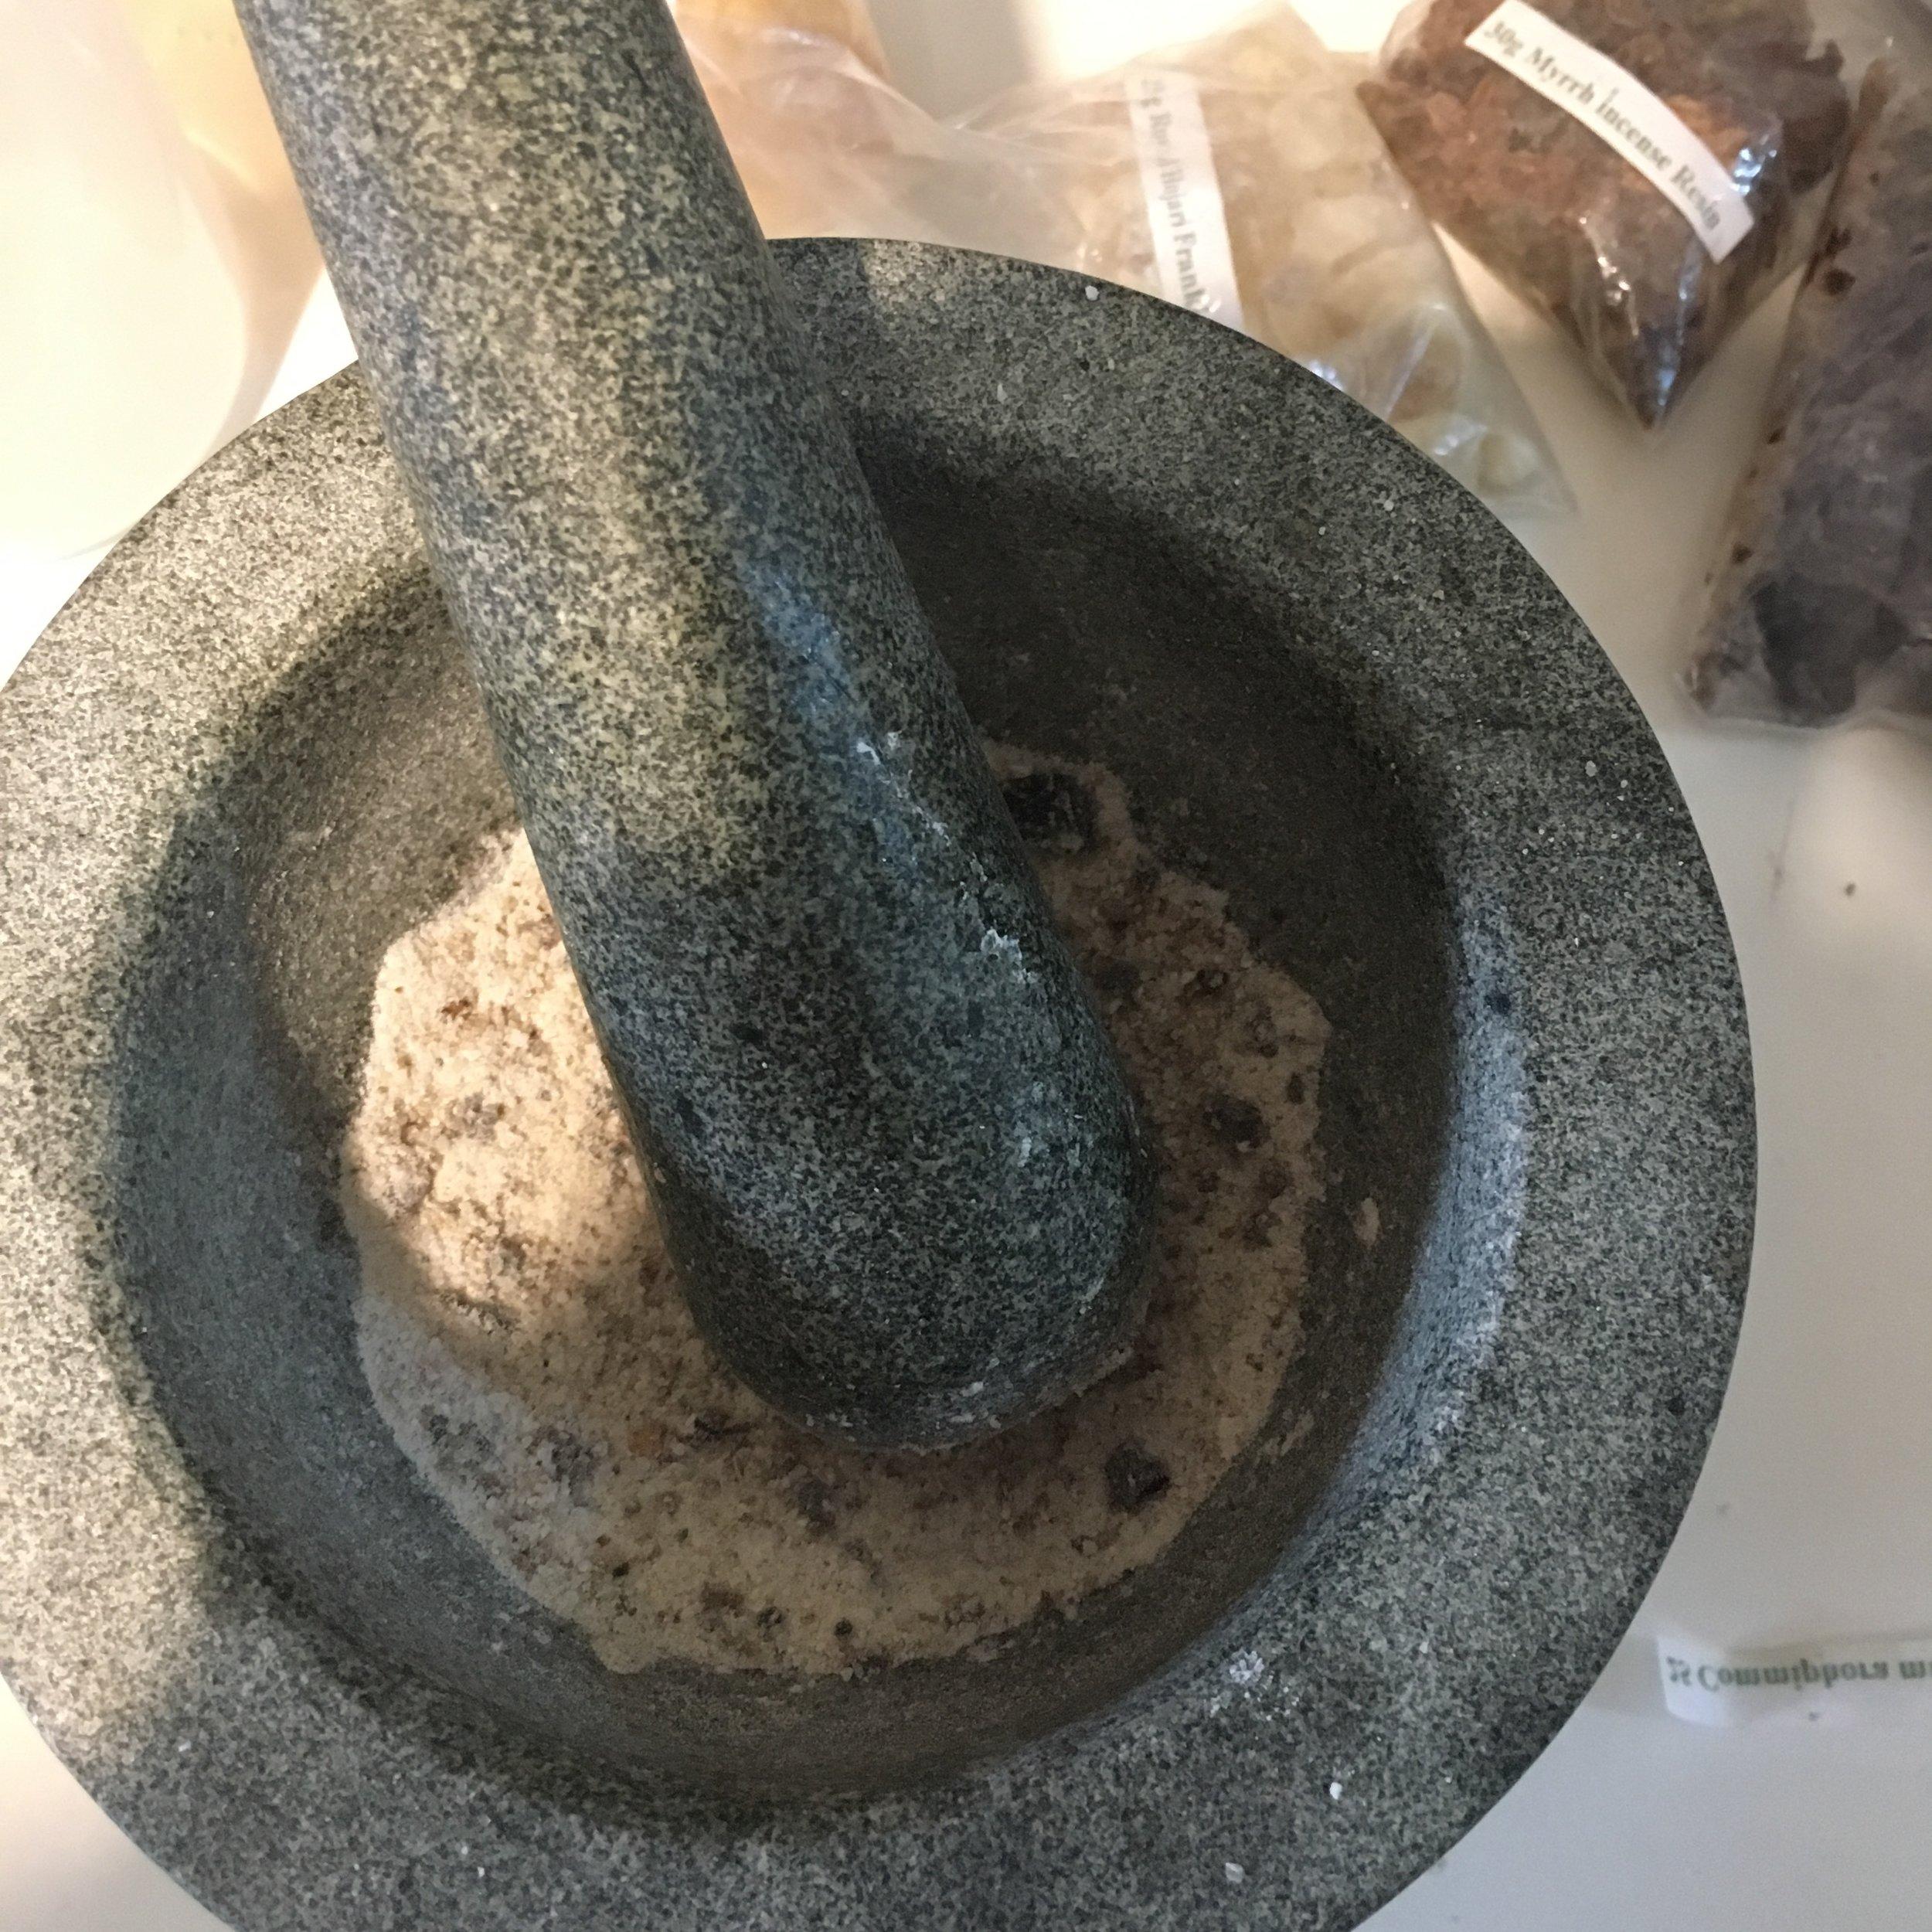 Frank and Myrrh pestle and mortar.JPG